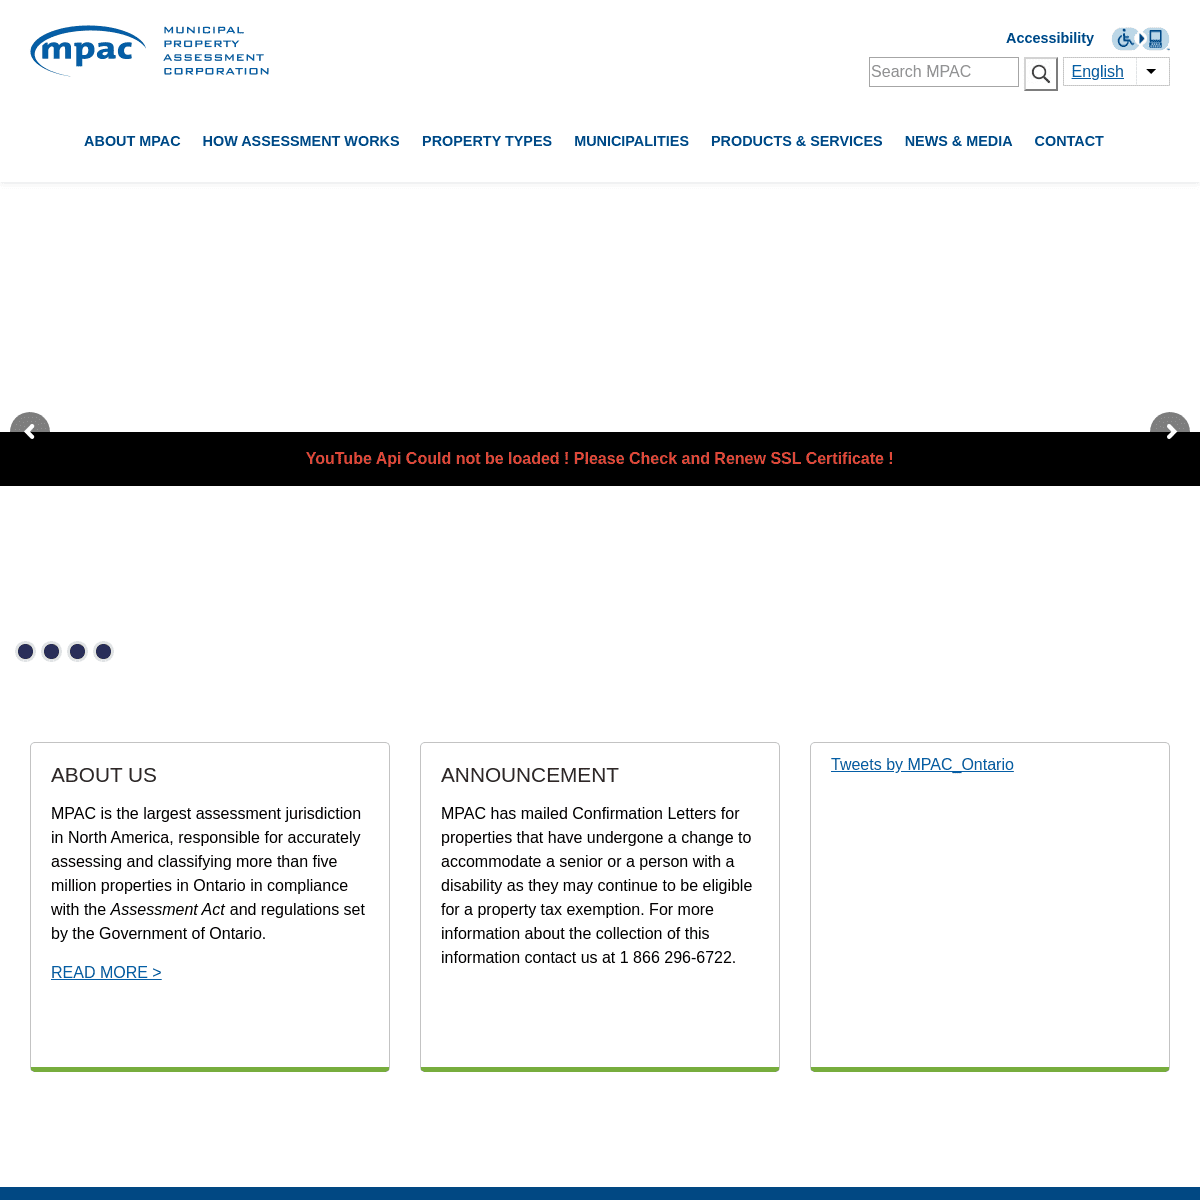 Welcome to MPAC - MPAC